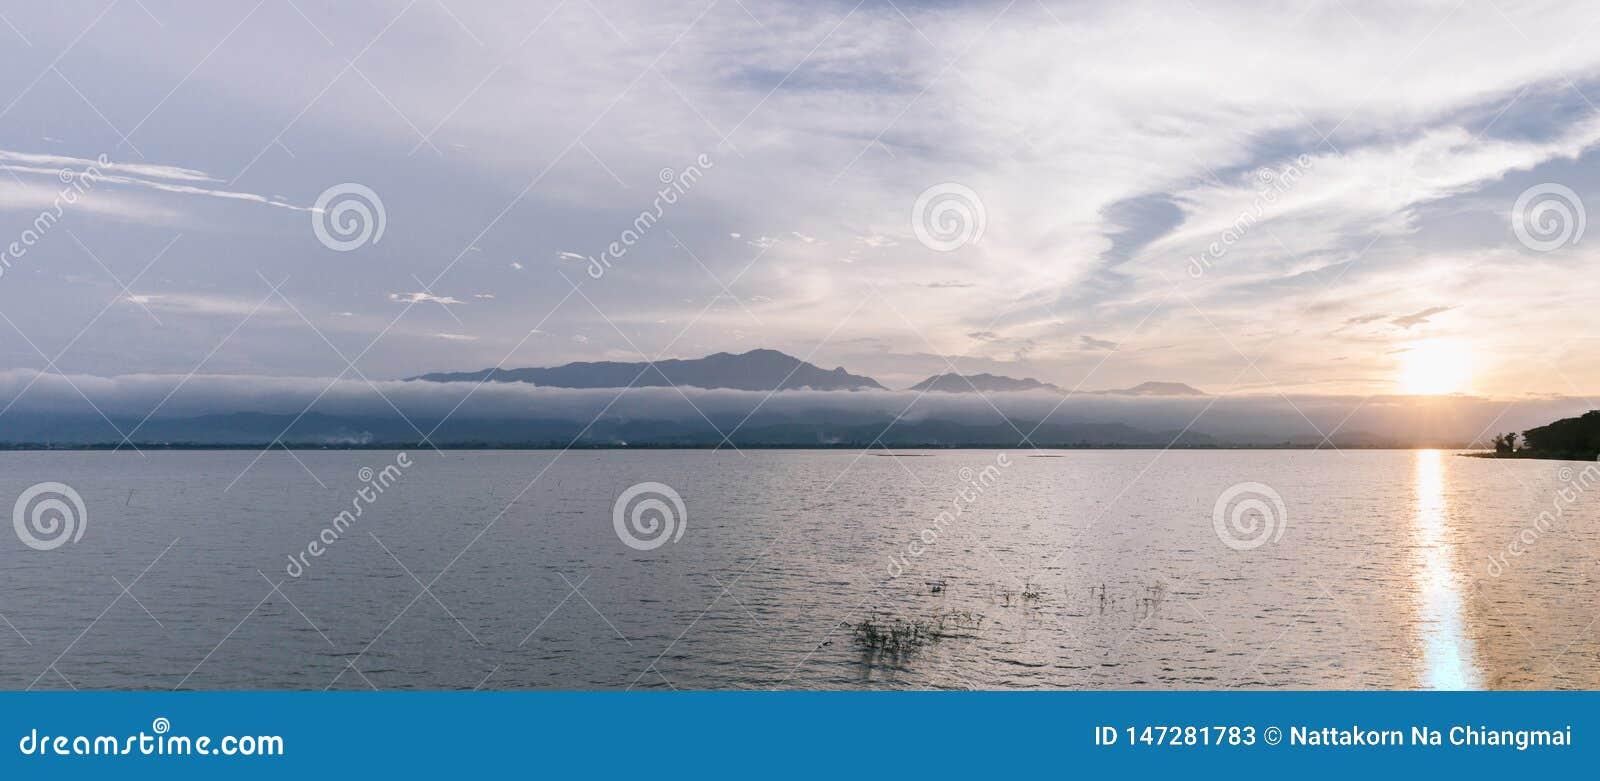 Beautiful lake and mountain during sunset landscape in Panorama at Phayao Lake.